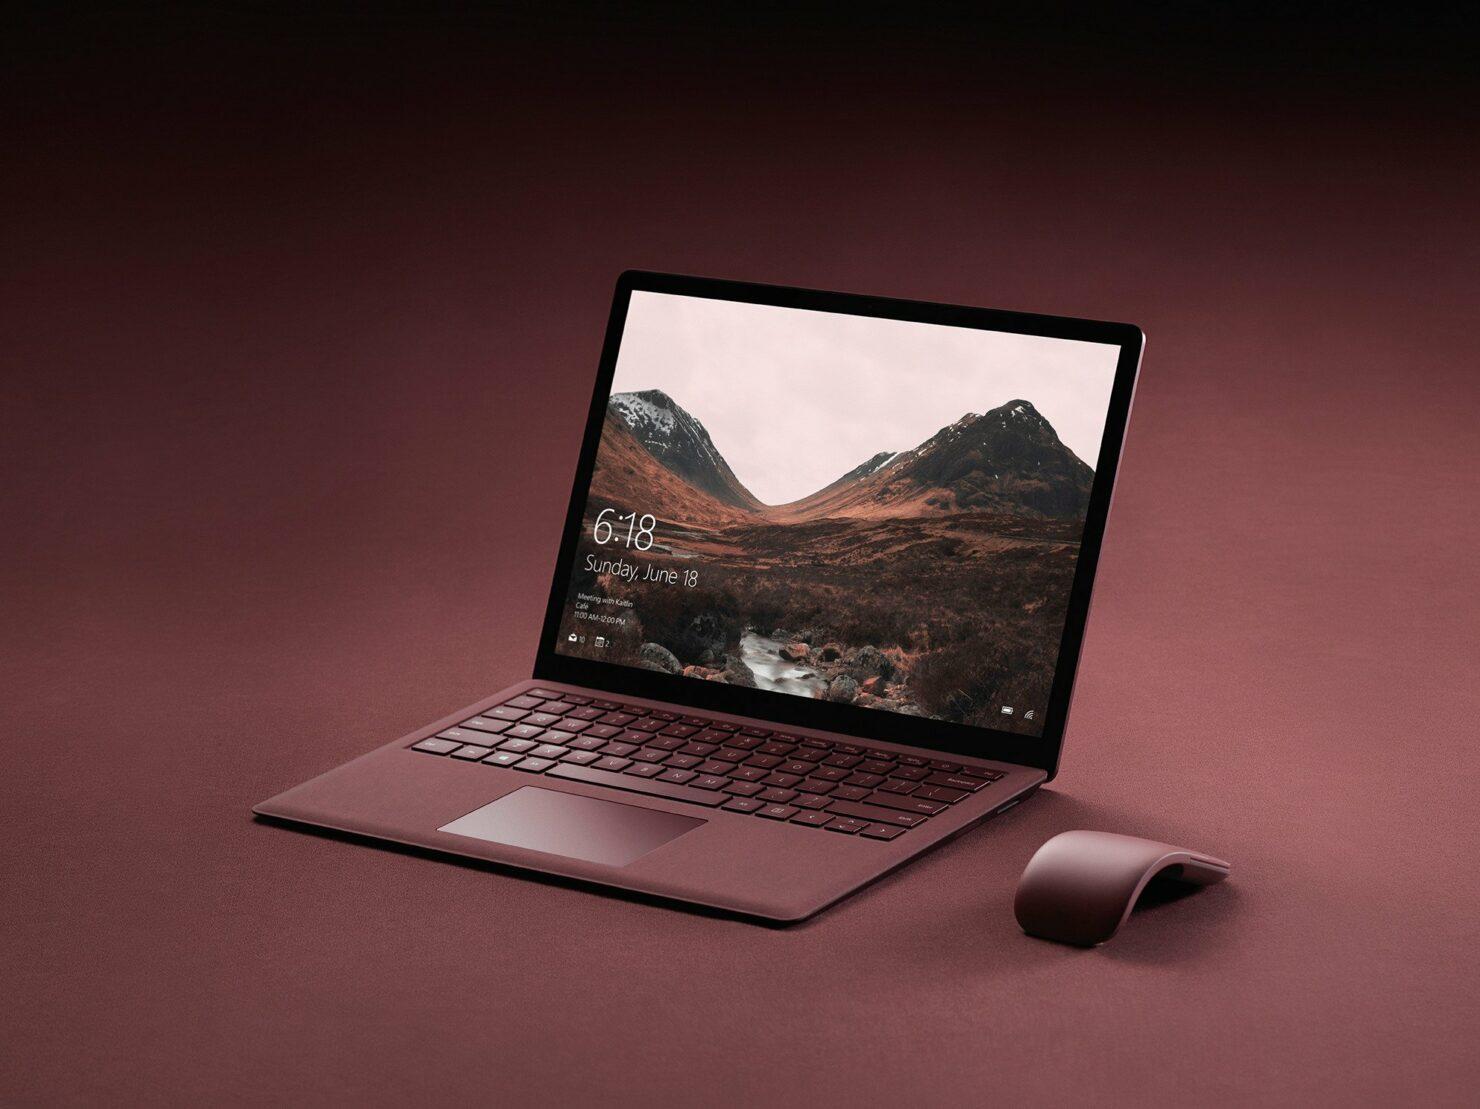 Surface Laptop 3 windows 10 Fall Creators Update